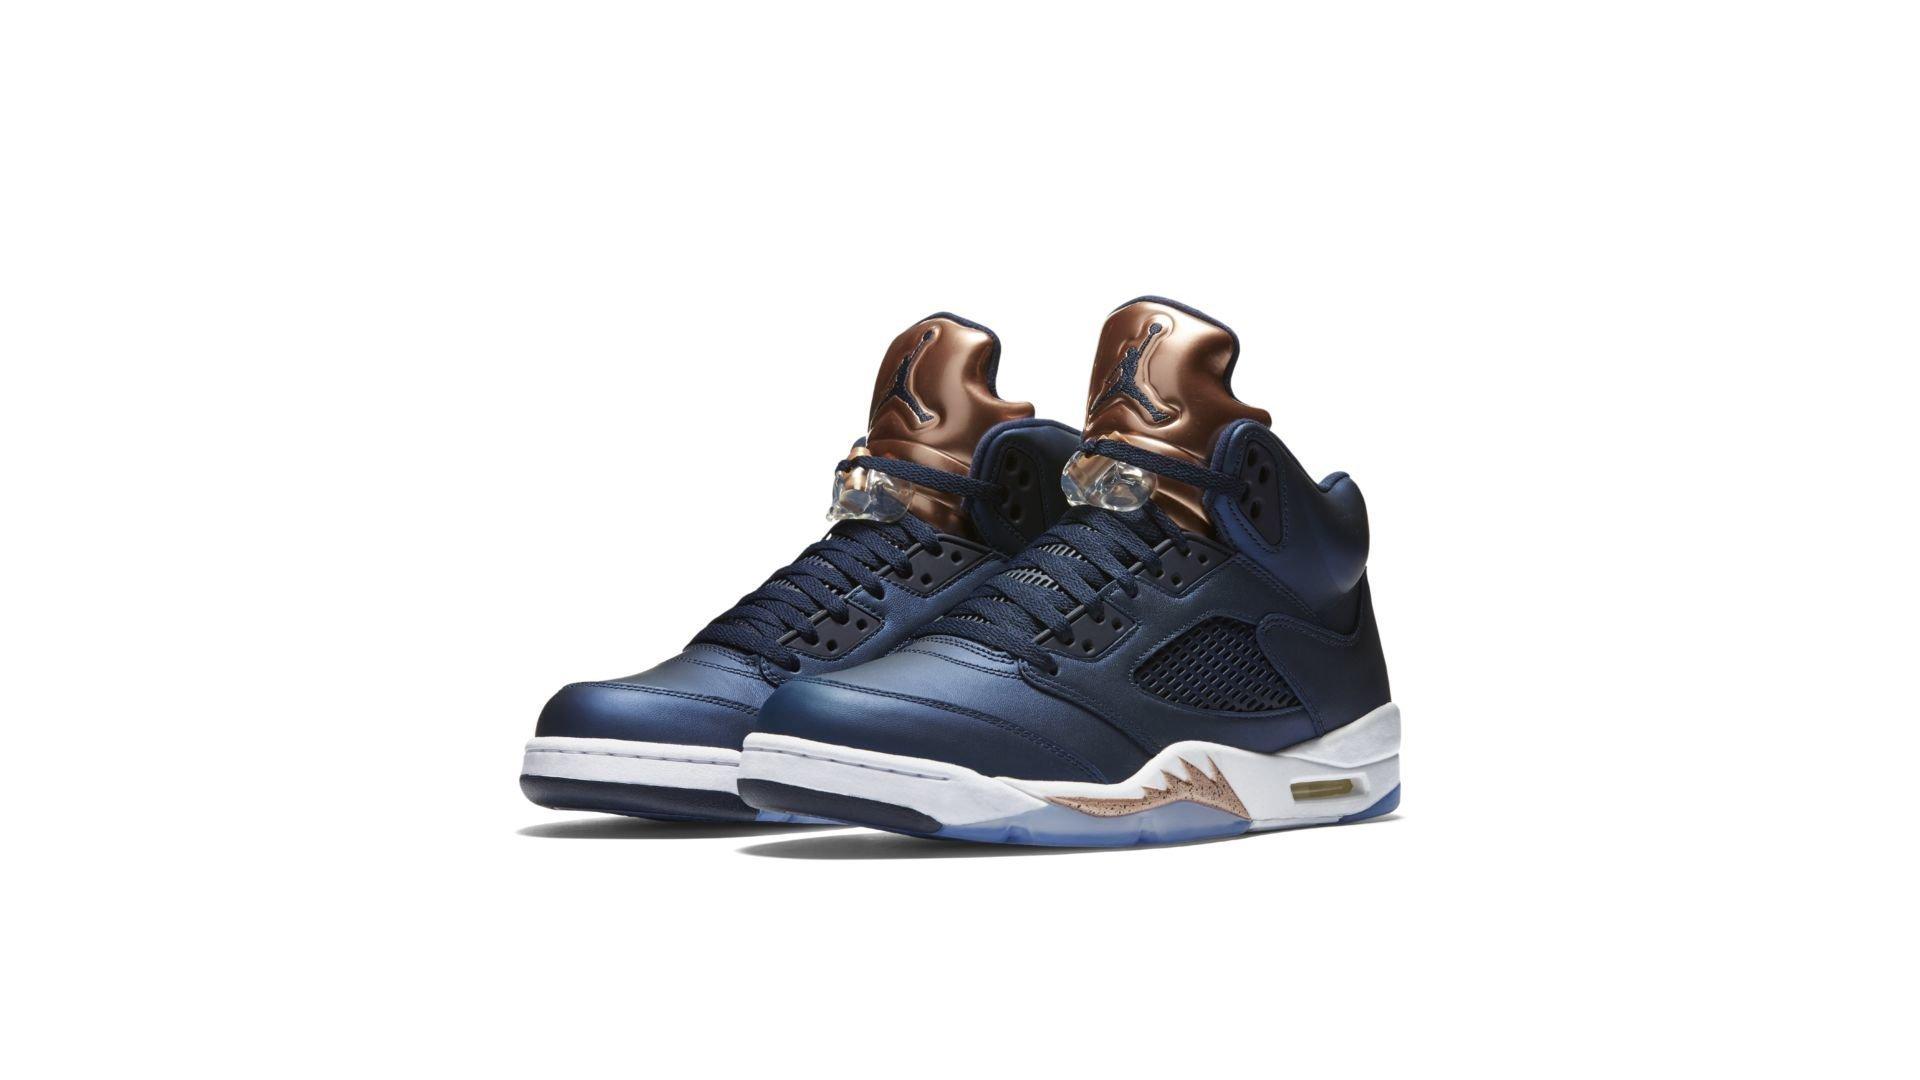 Jordan 5 Retro Bronze (136027-416)